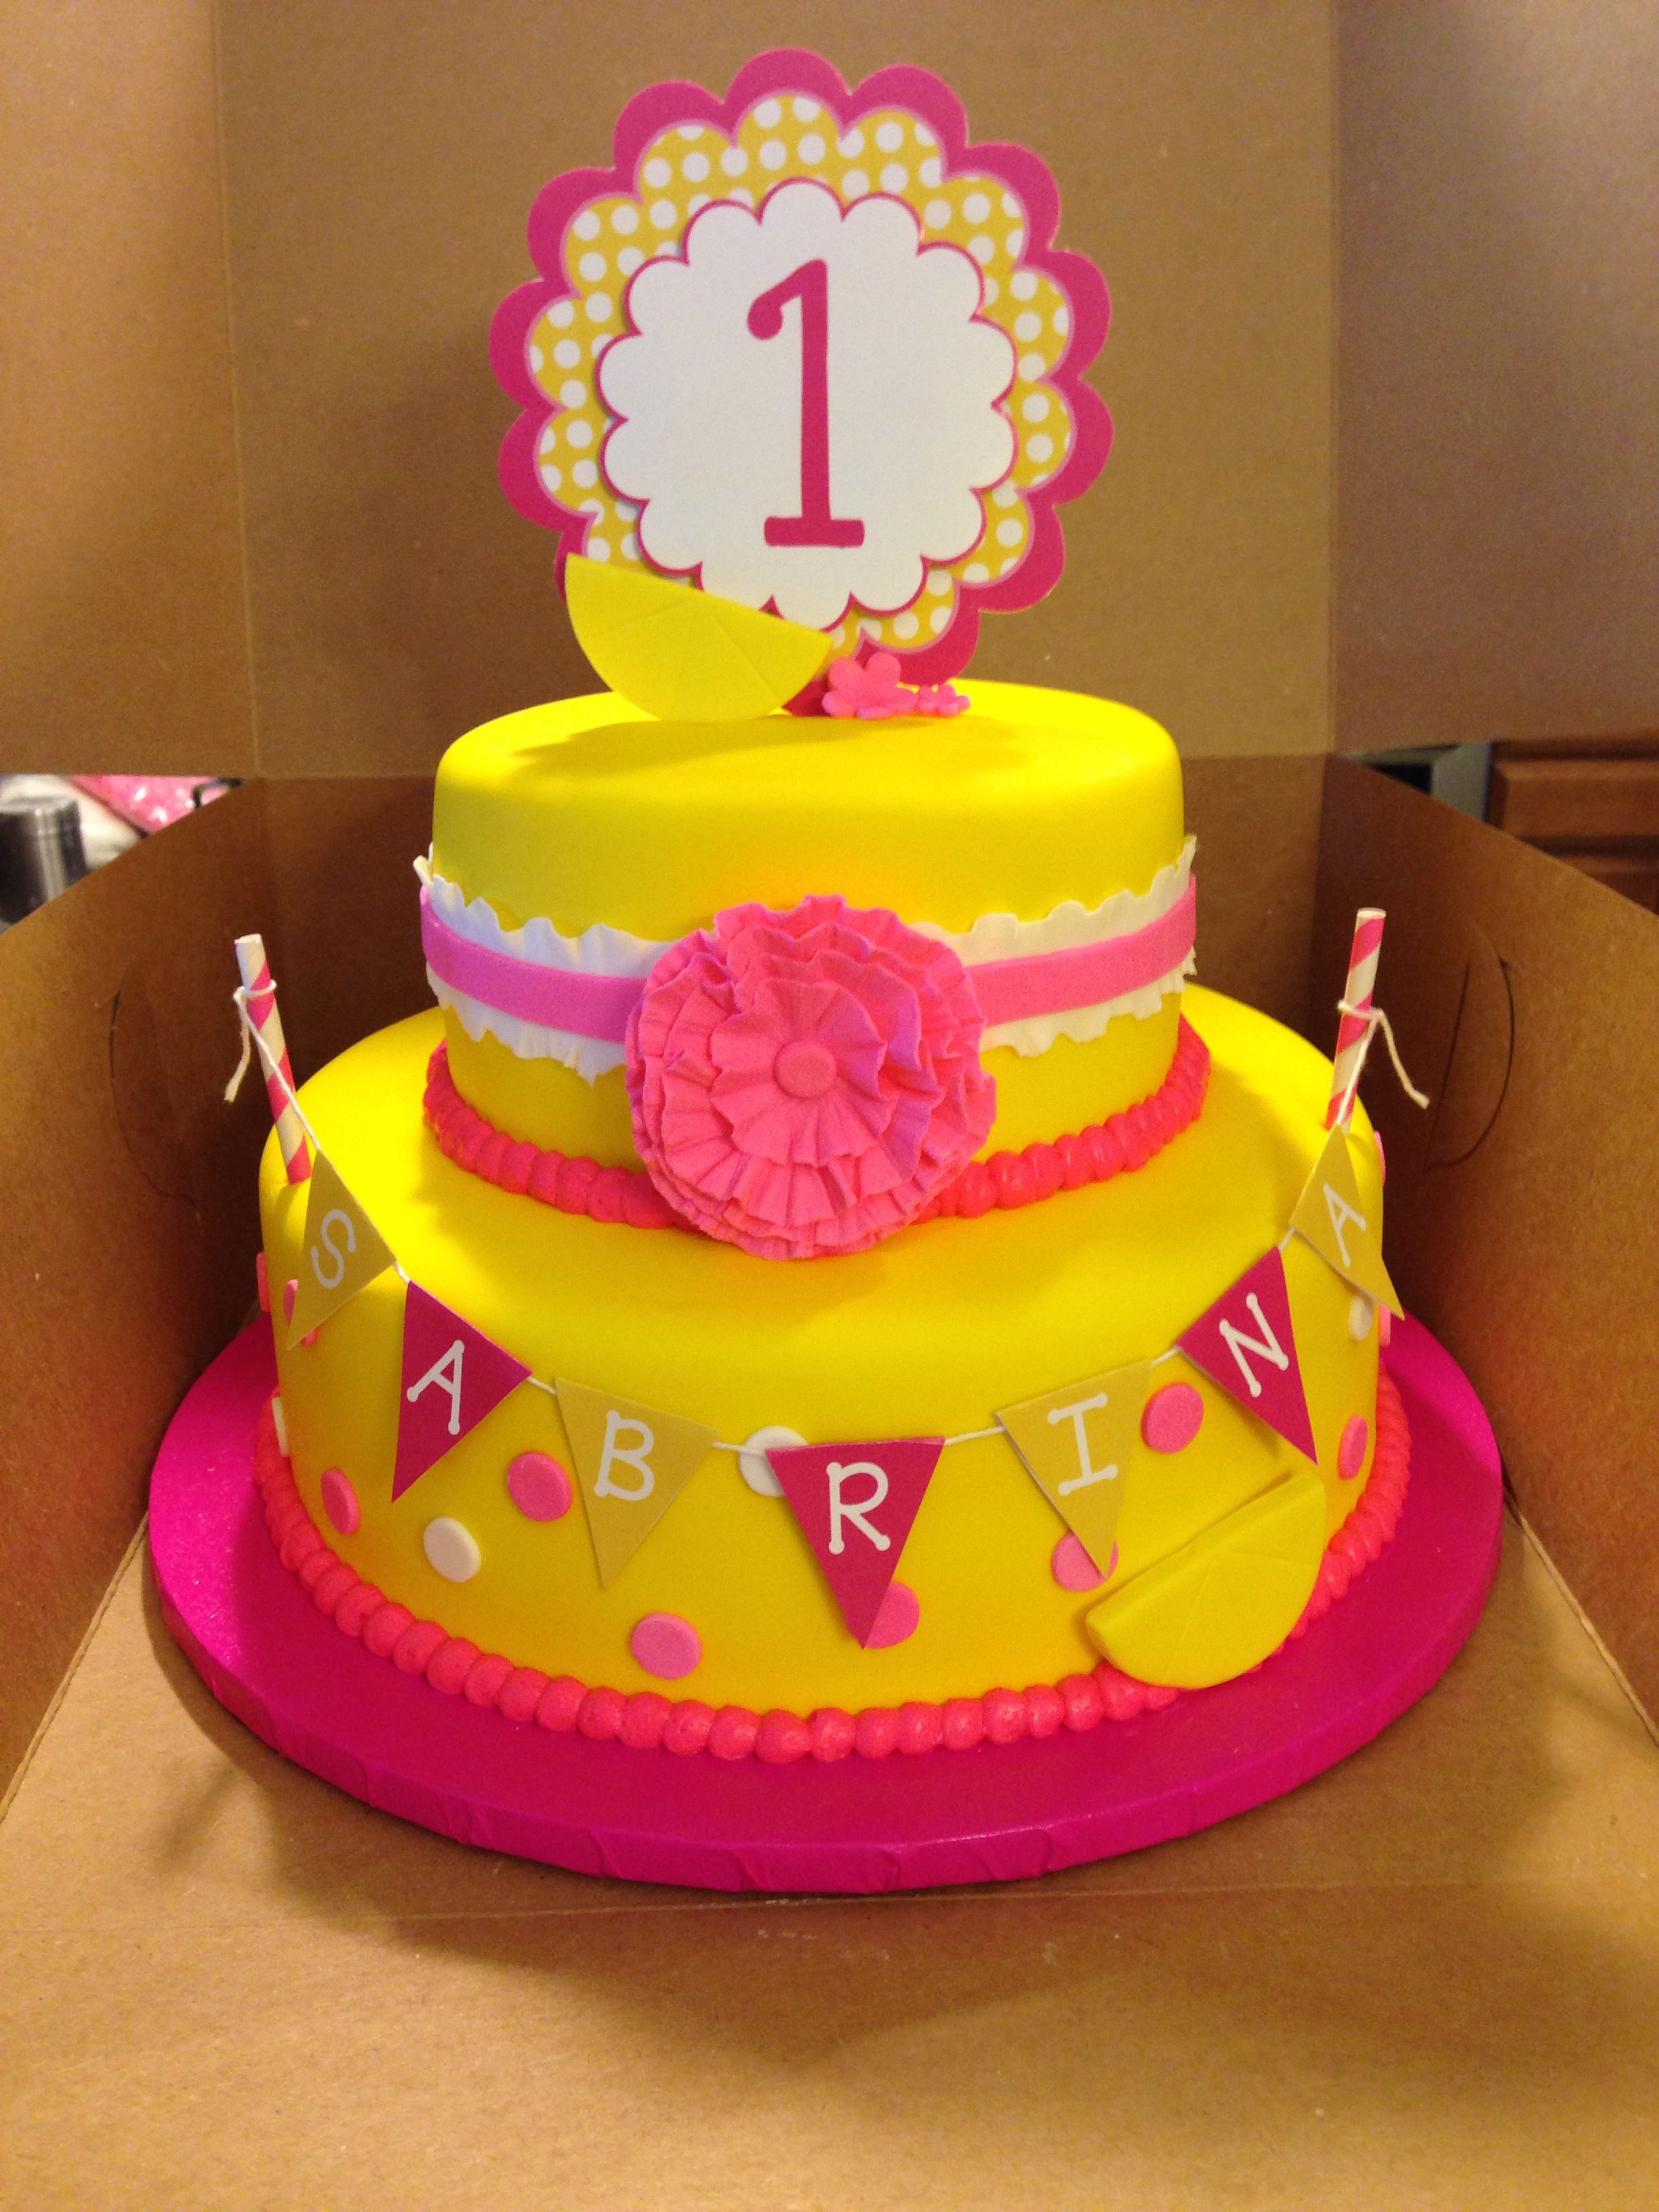 Astonishing Pink Lemonade Themed Cake Lemonade Stand Birthday Pink Lemonade Funny Birthday Cards Online Drosicarndamsfinfo